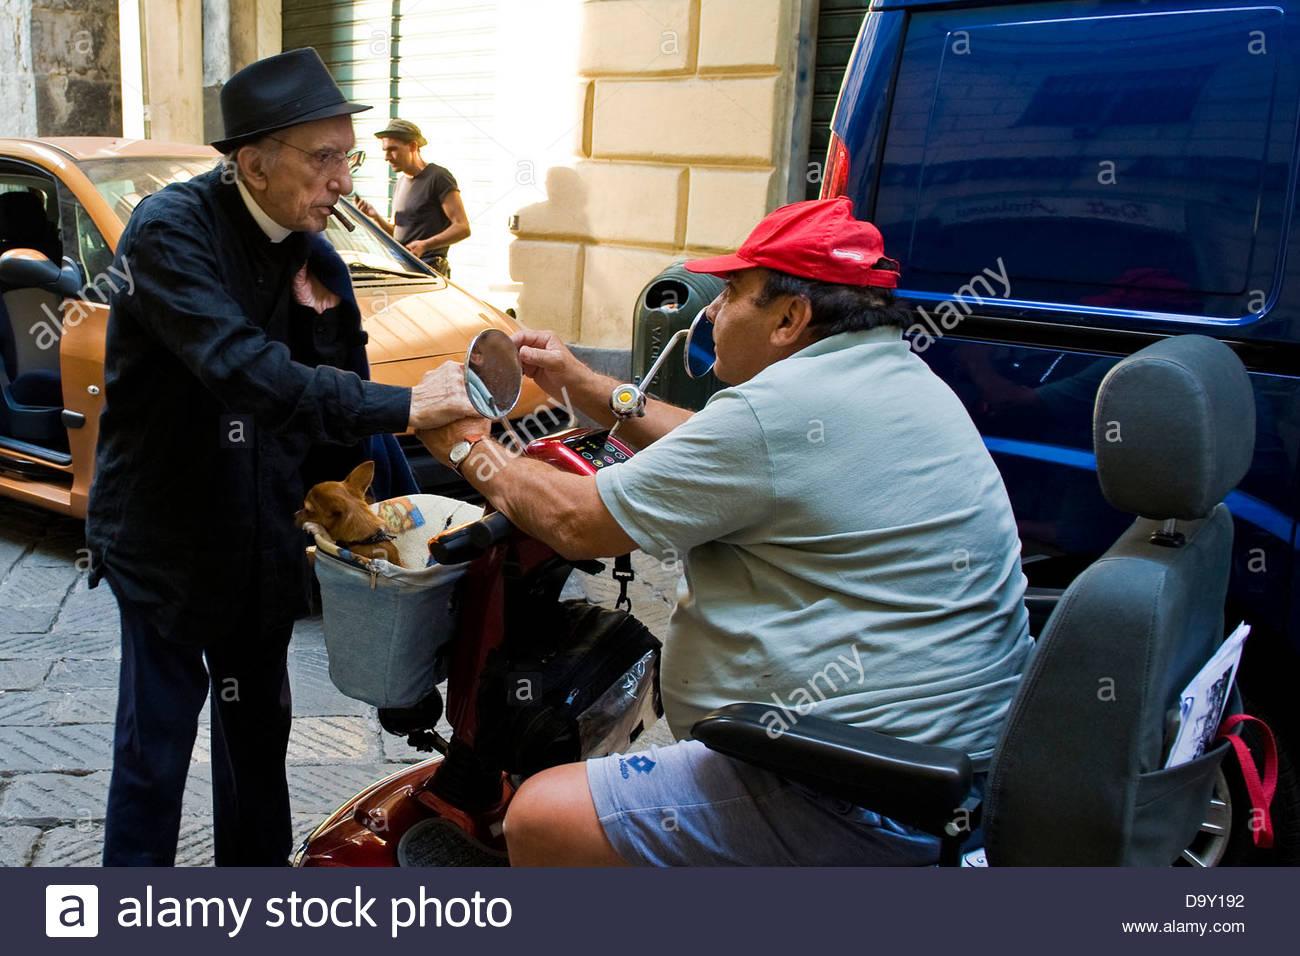 Don Andrea talking to a disabled person in the caruggi. Don Andrea Gallo,Genoa,Italy - Stock Image